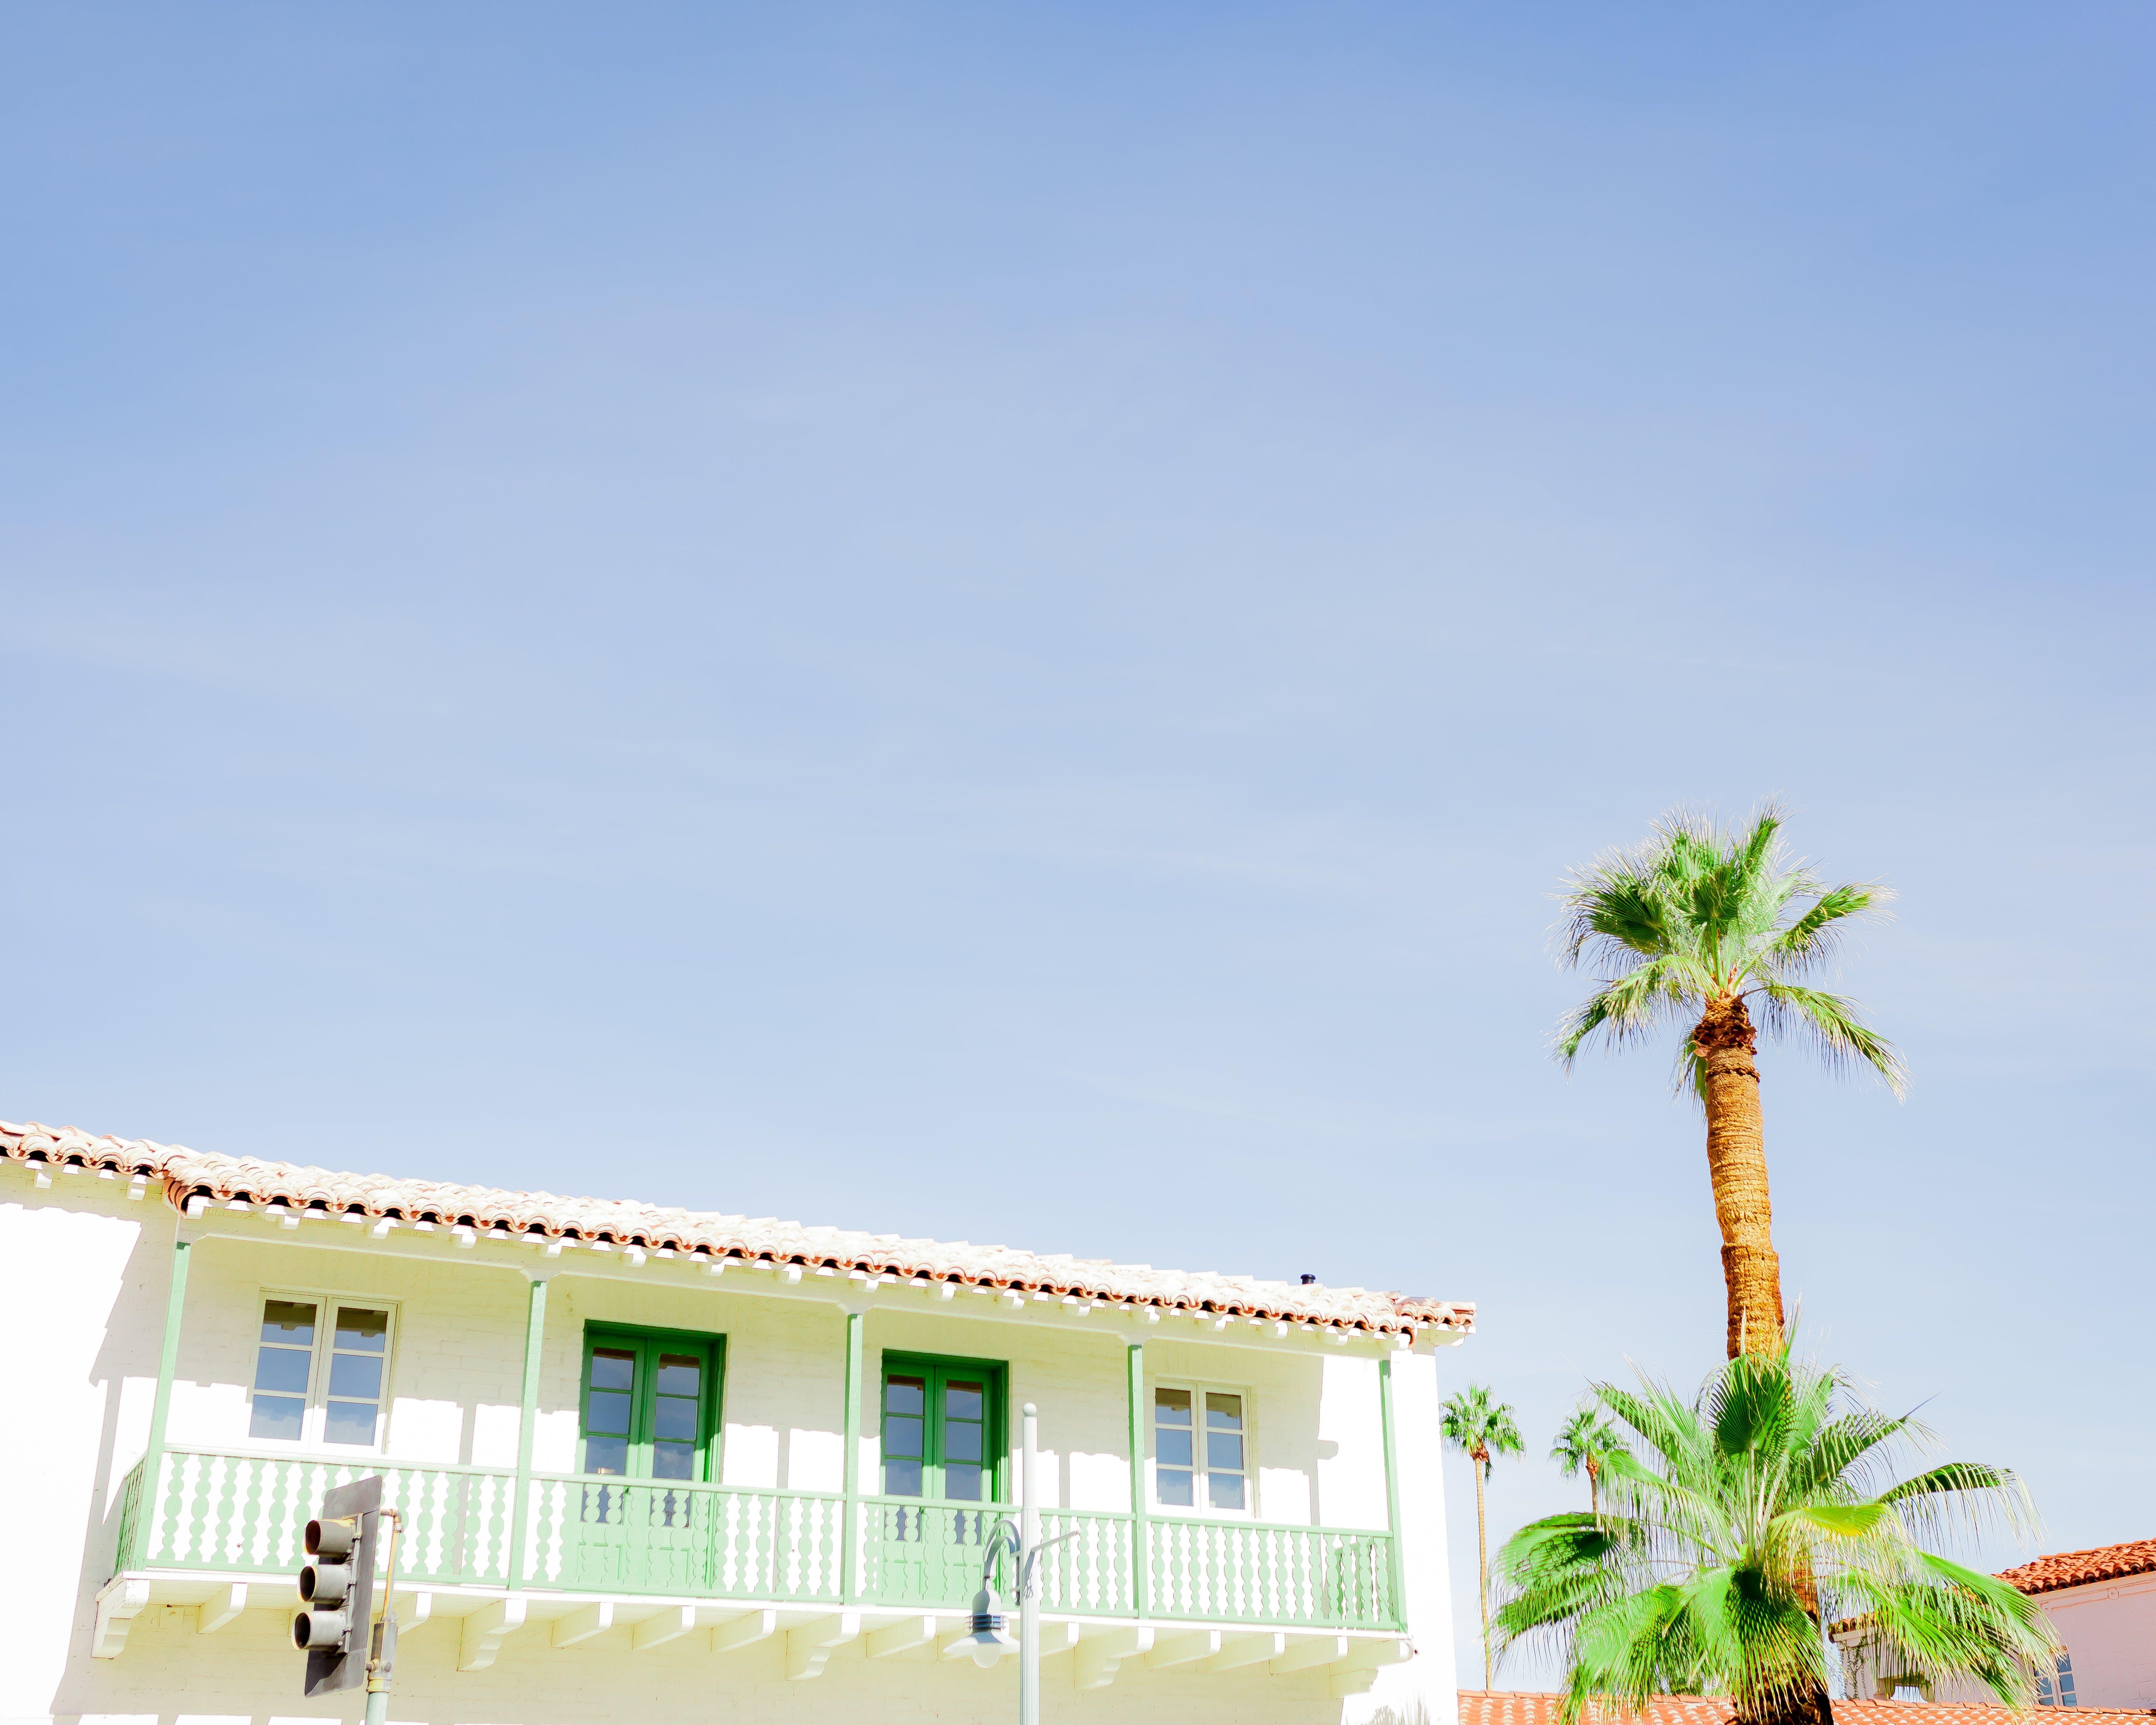 Palm Tree Under Blue Sky